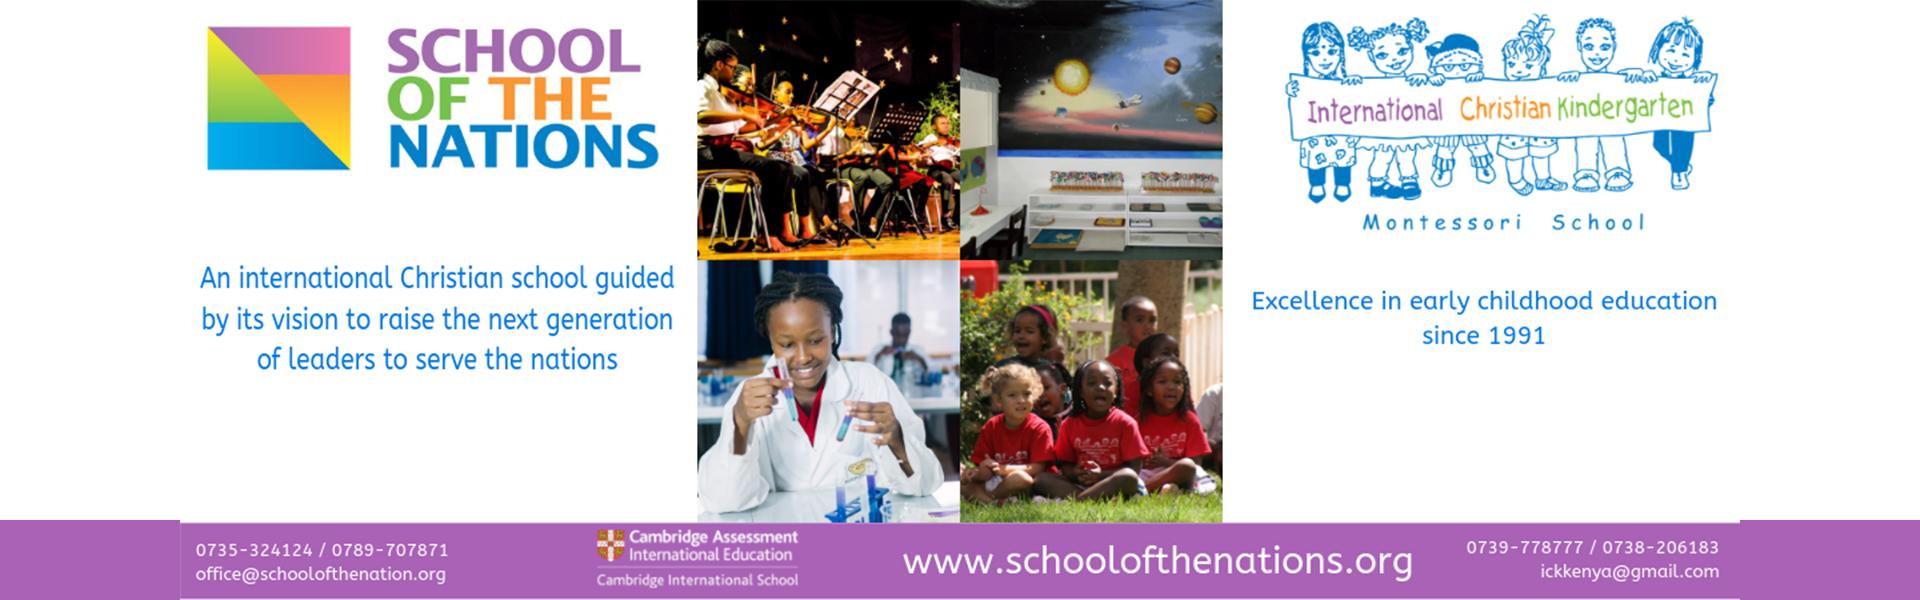 isef-school-of-nations